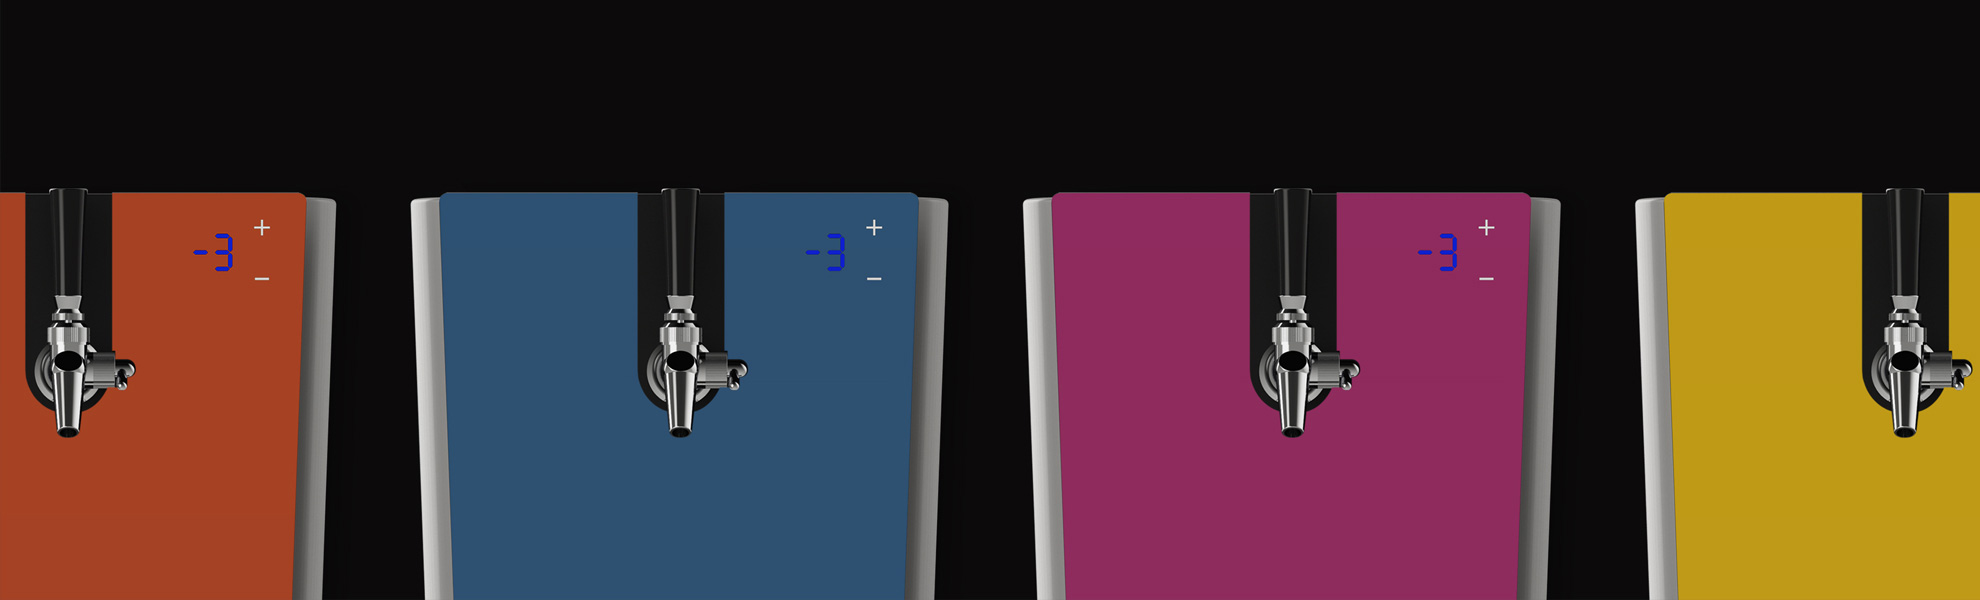 chelles-e-hayashi-design-portfolio-embraco-chopeira-growler-produto